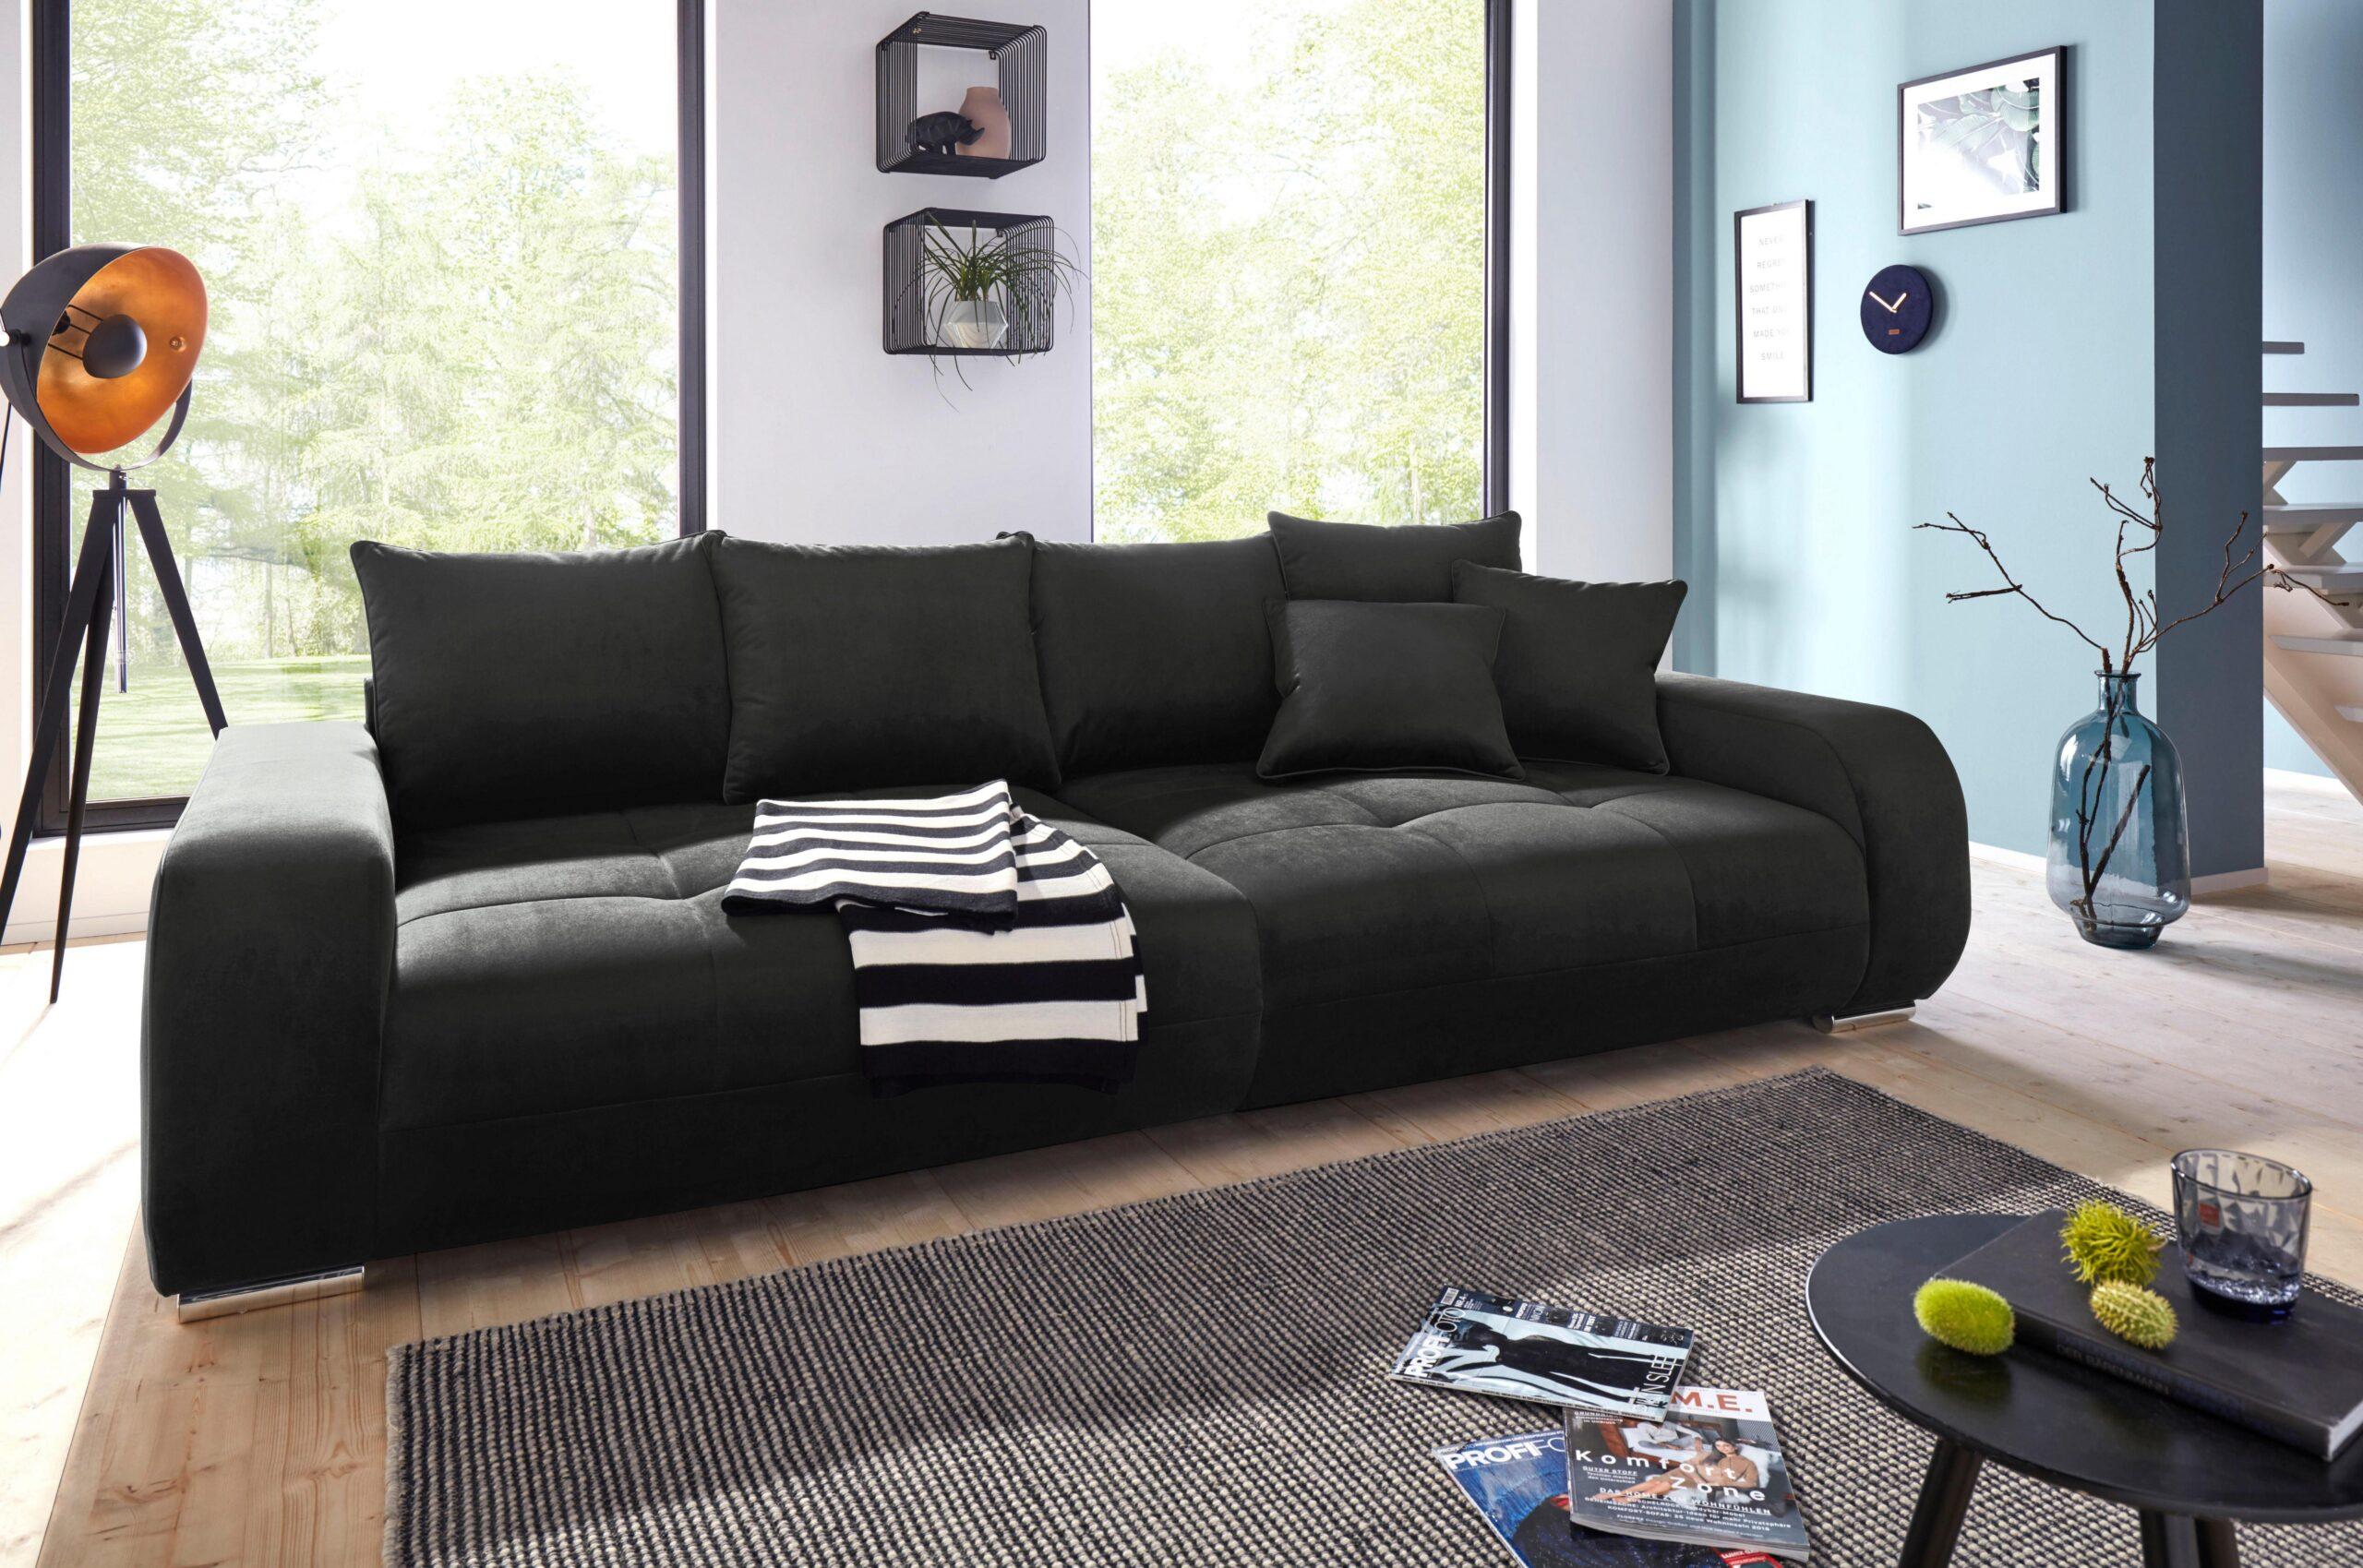 Full Size of Big Sofa Leder Suchmaschine Ladendirektde Xxl Grau L Form 3 Sitzer Chesterfield Gebraucht 2 Erpo In Indomo Günstig Elektrisch Konfigurator Mit Bettfunktion Sofa Big Sofa Leder